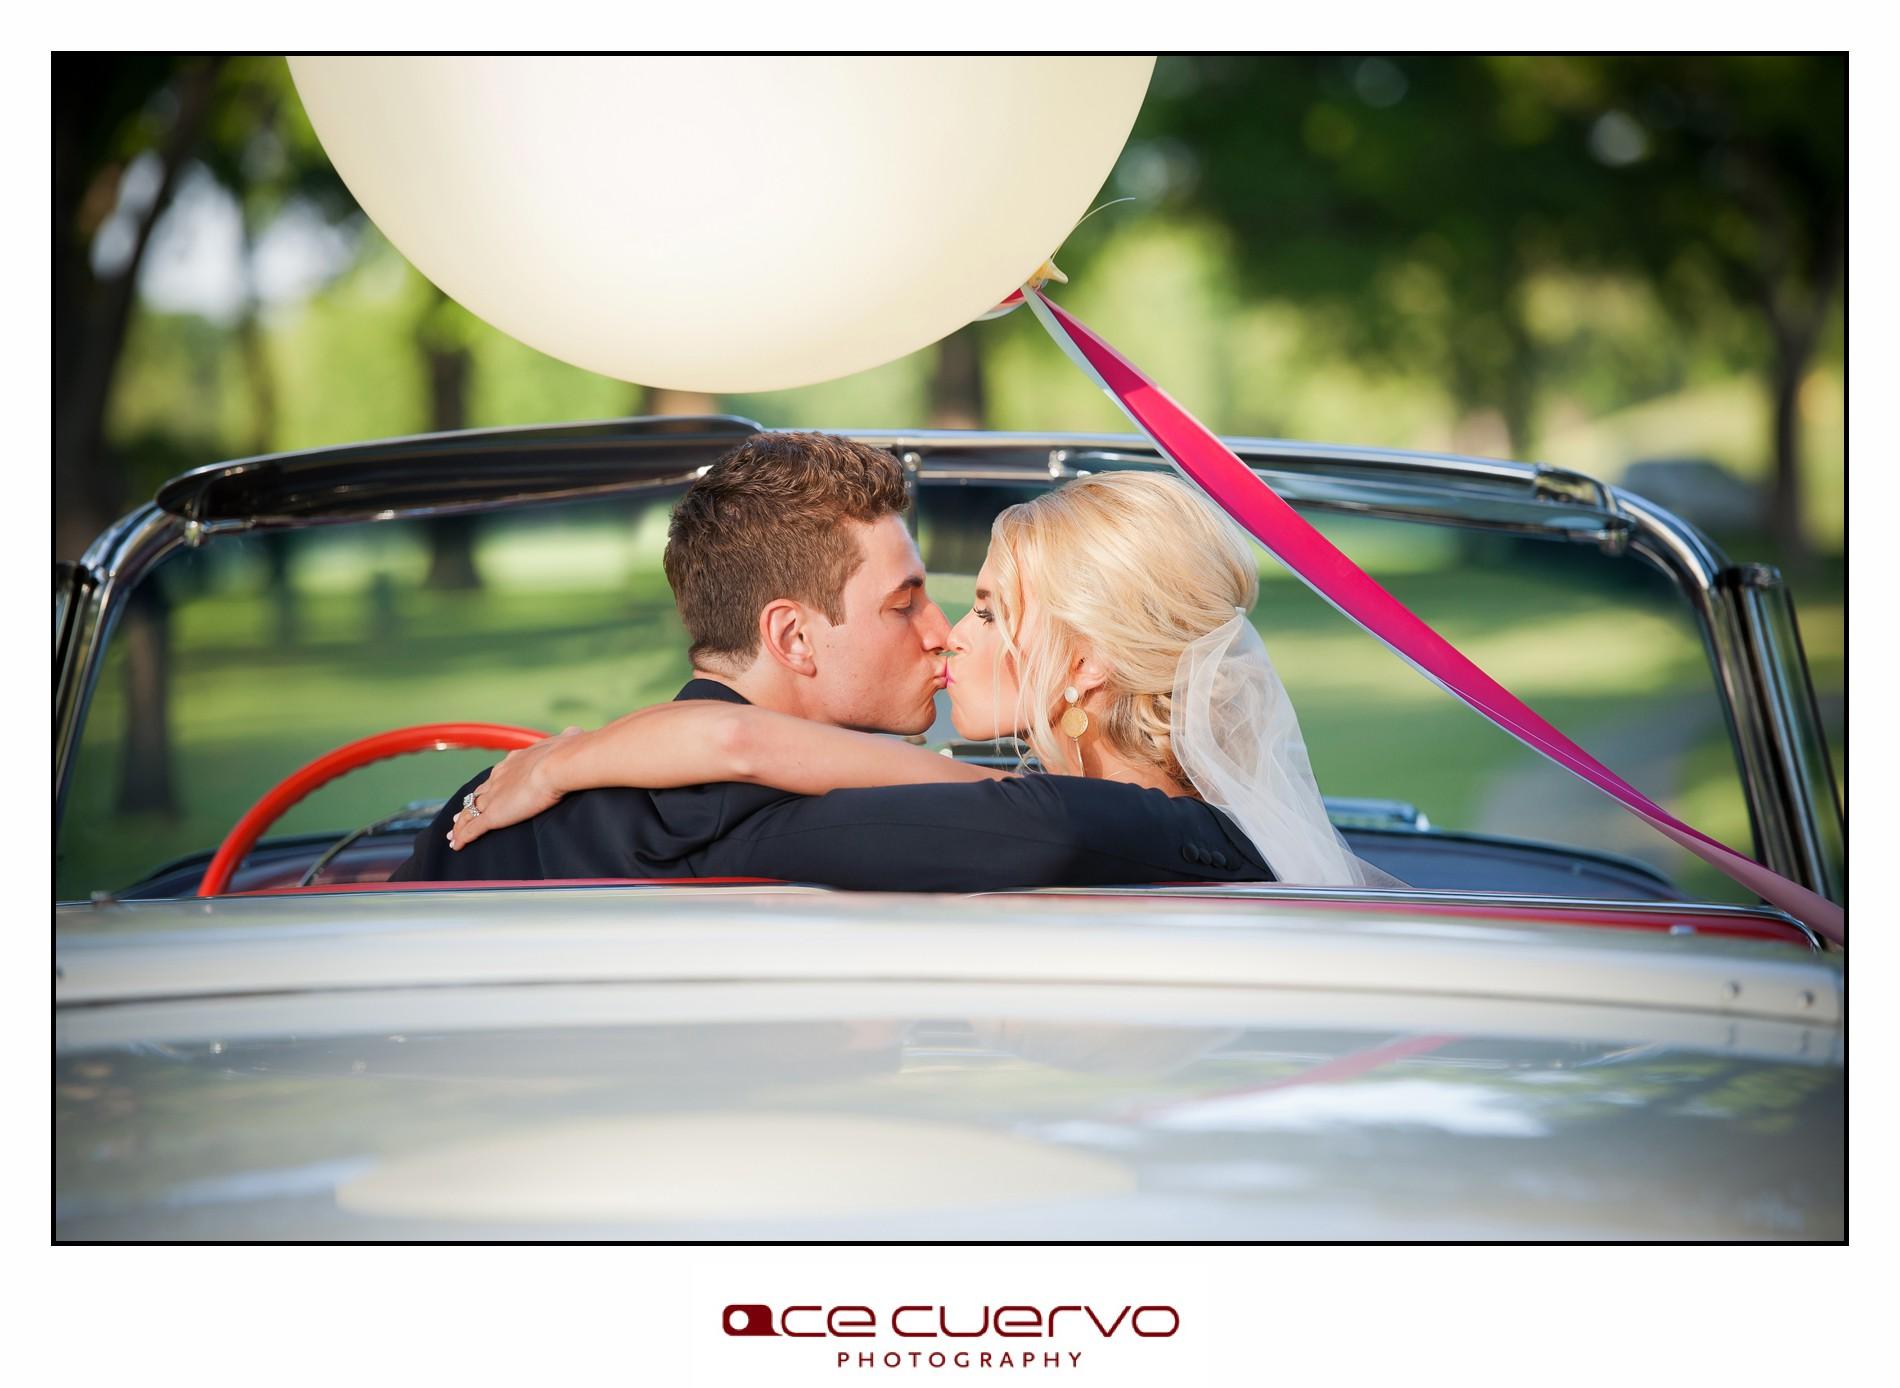 Ace Cuervo Photography